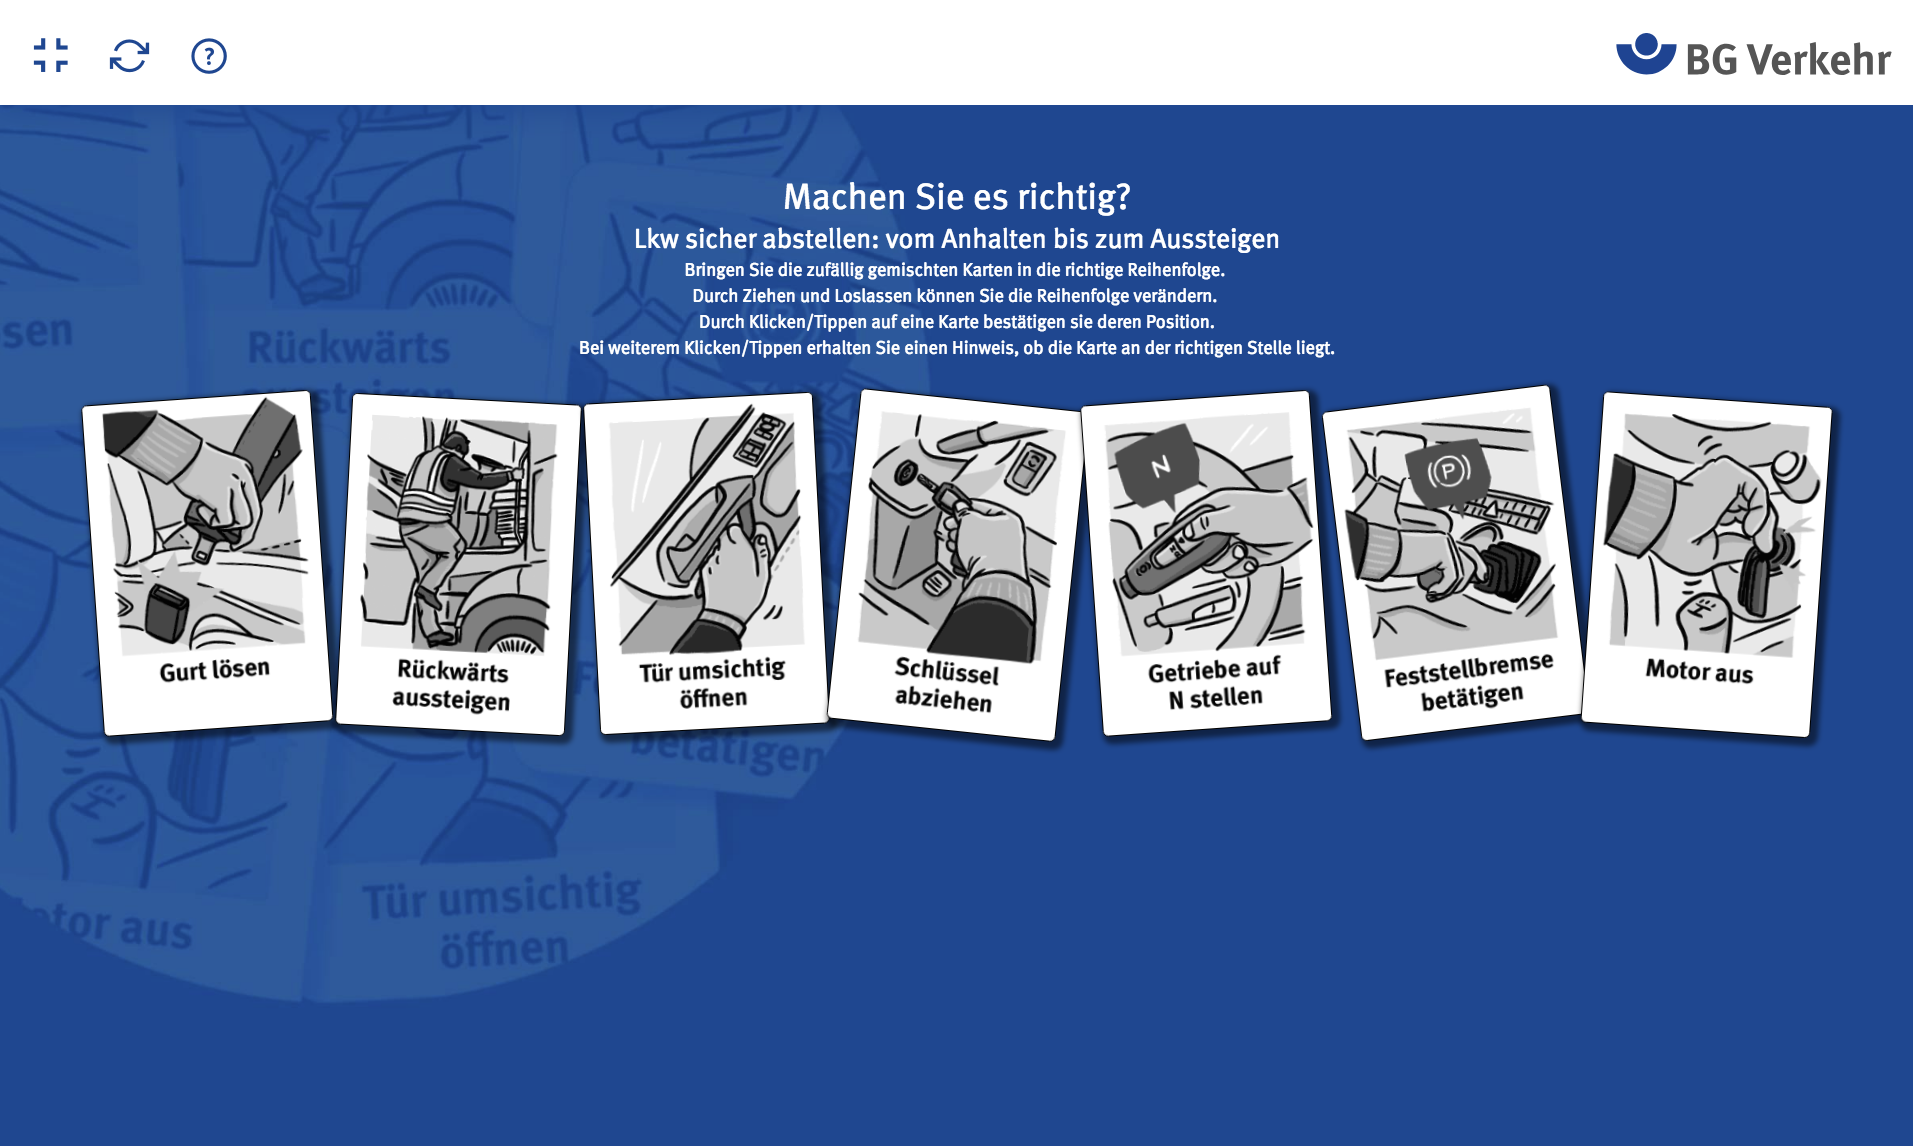 Foto: © Screenshot BG Verkehr